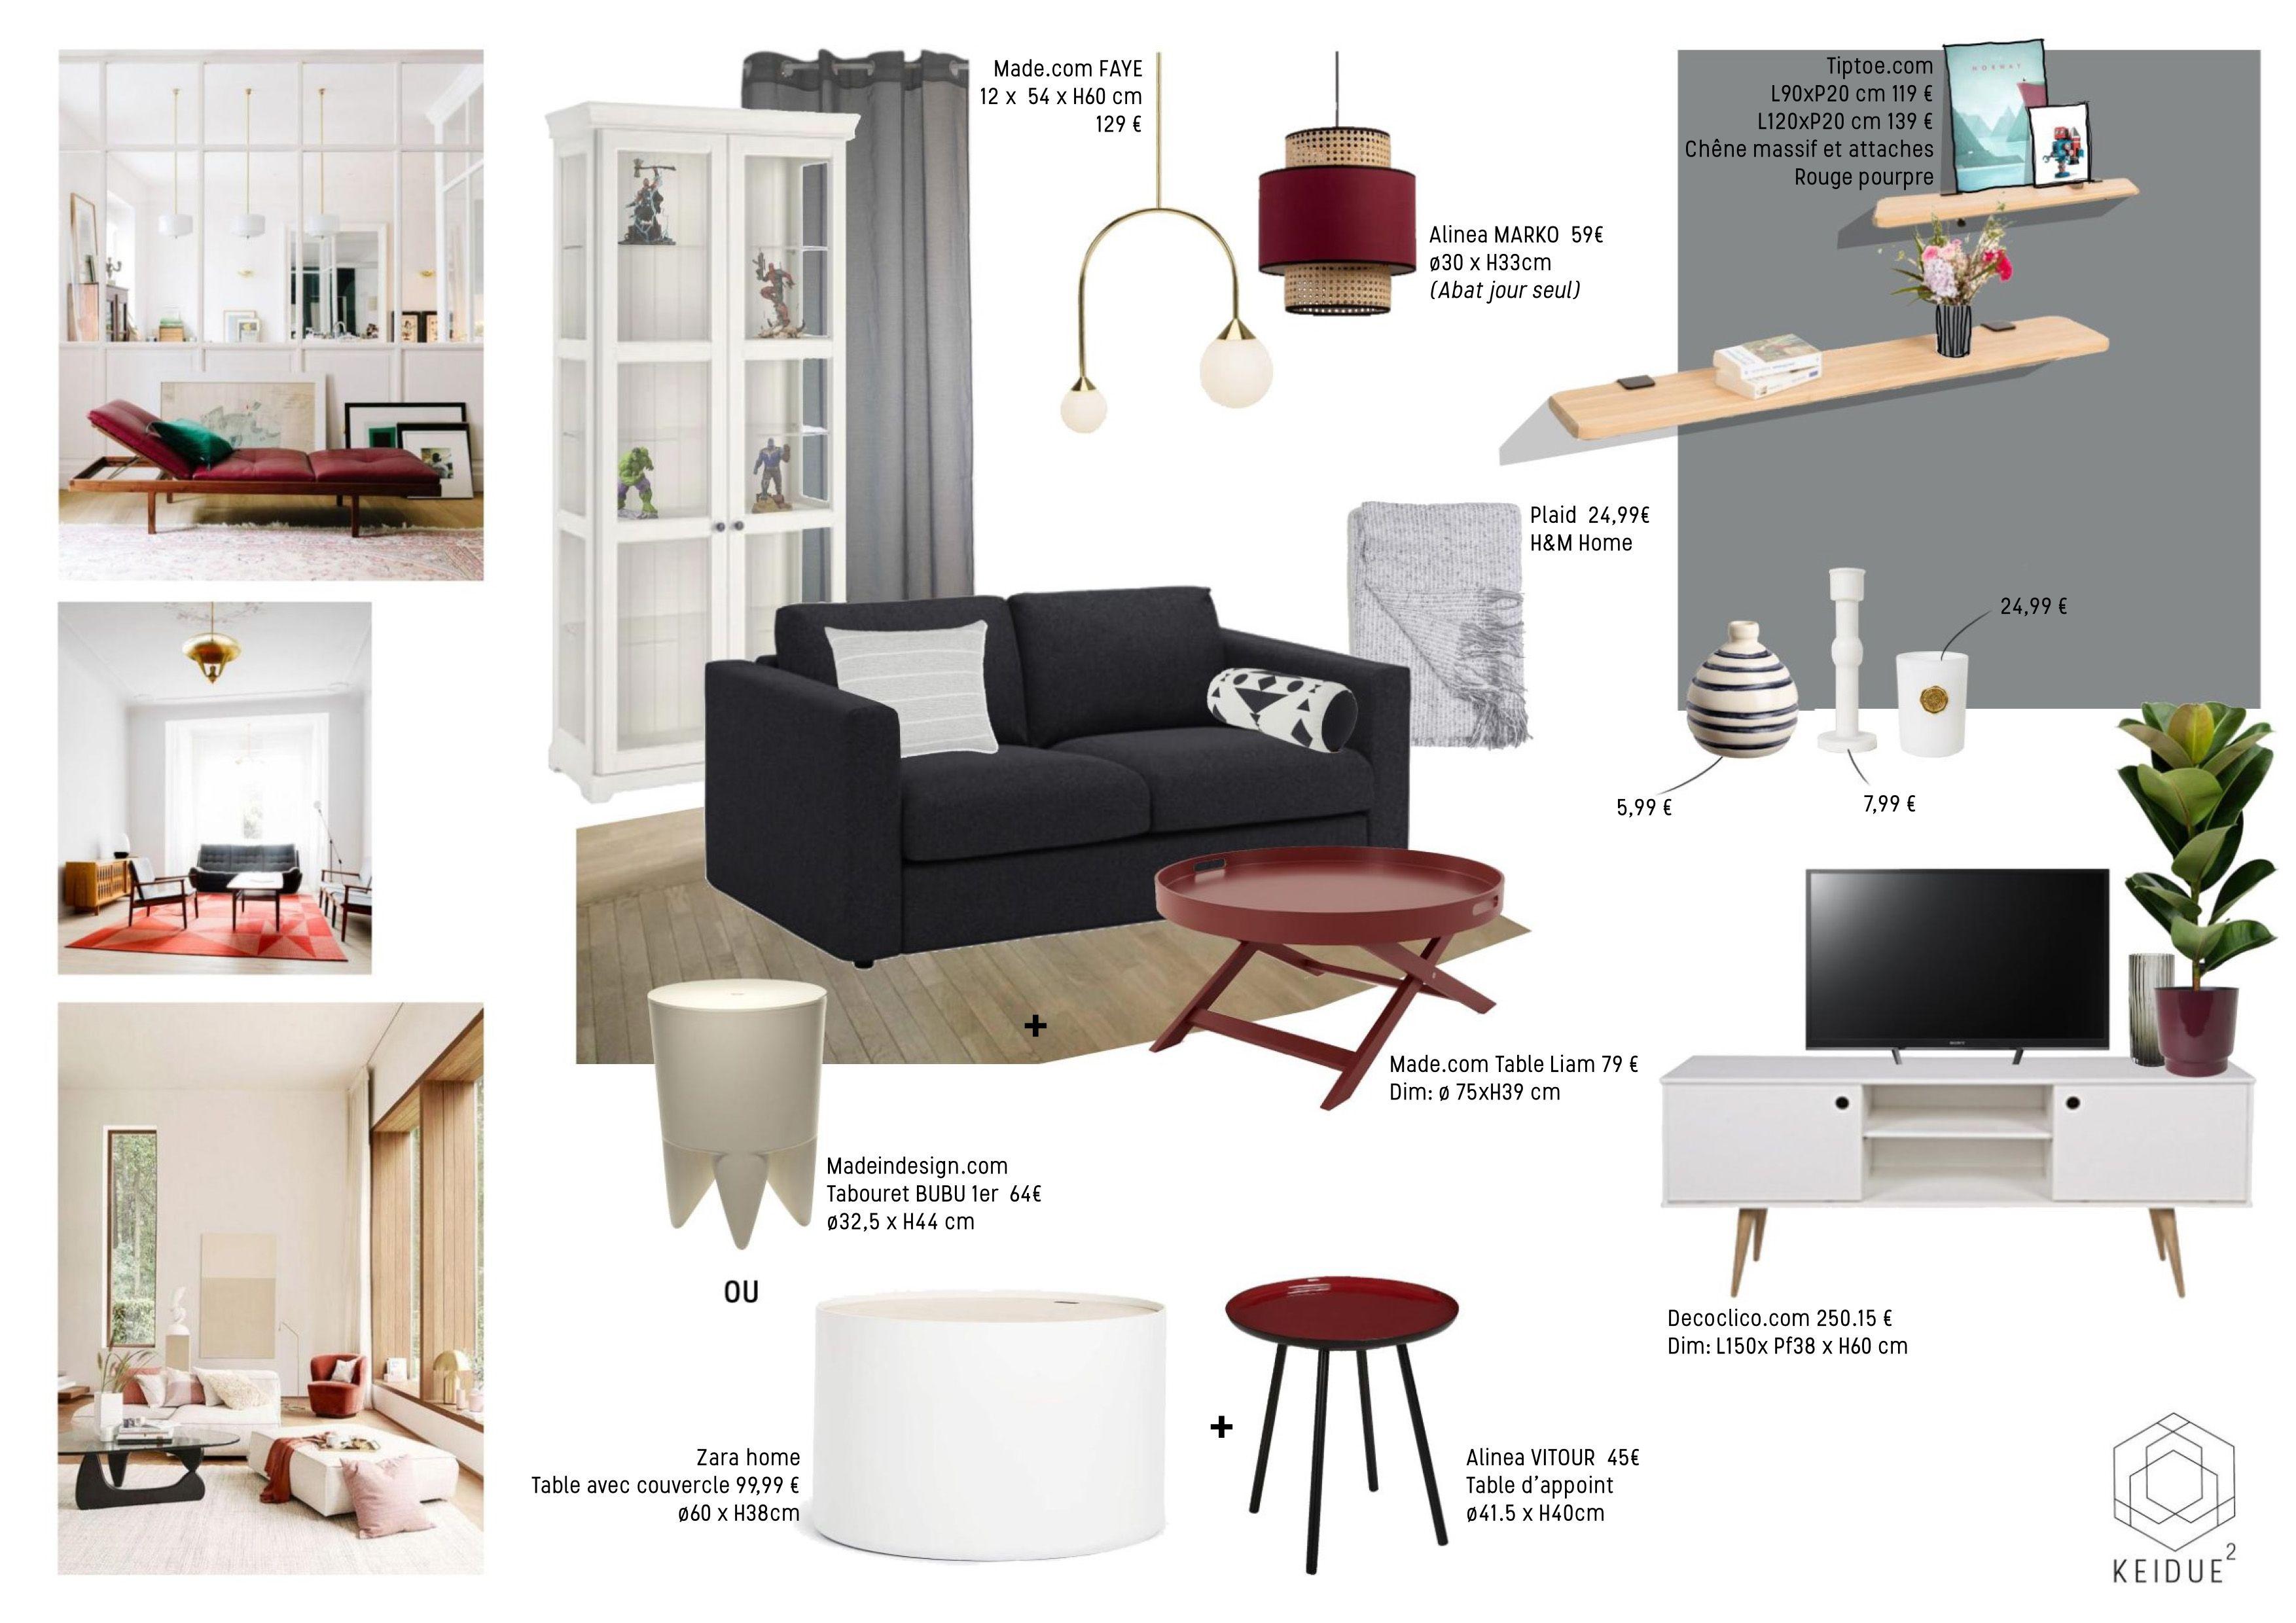 meubles alinea perols | muevete dance studio accueil facebook